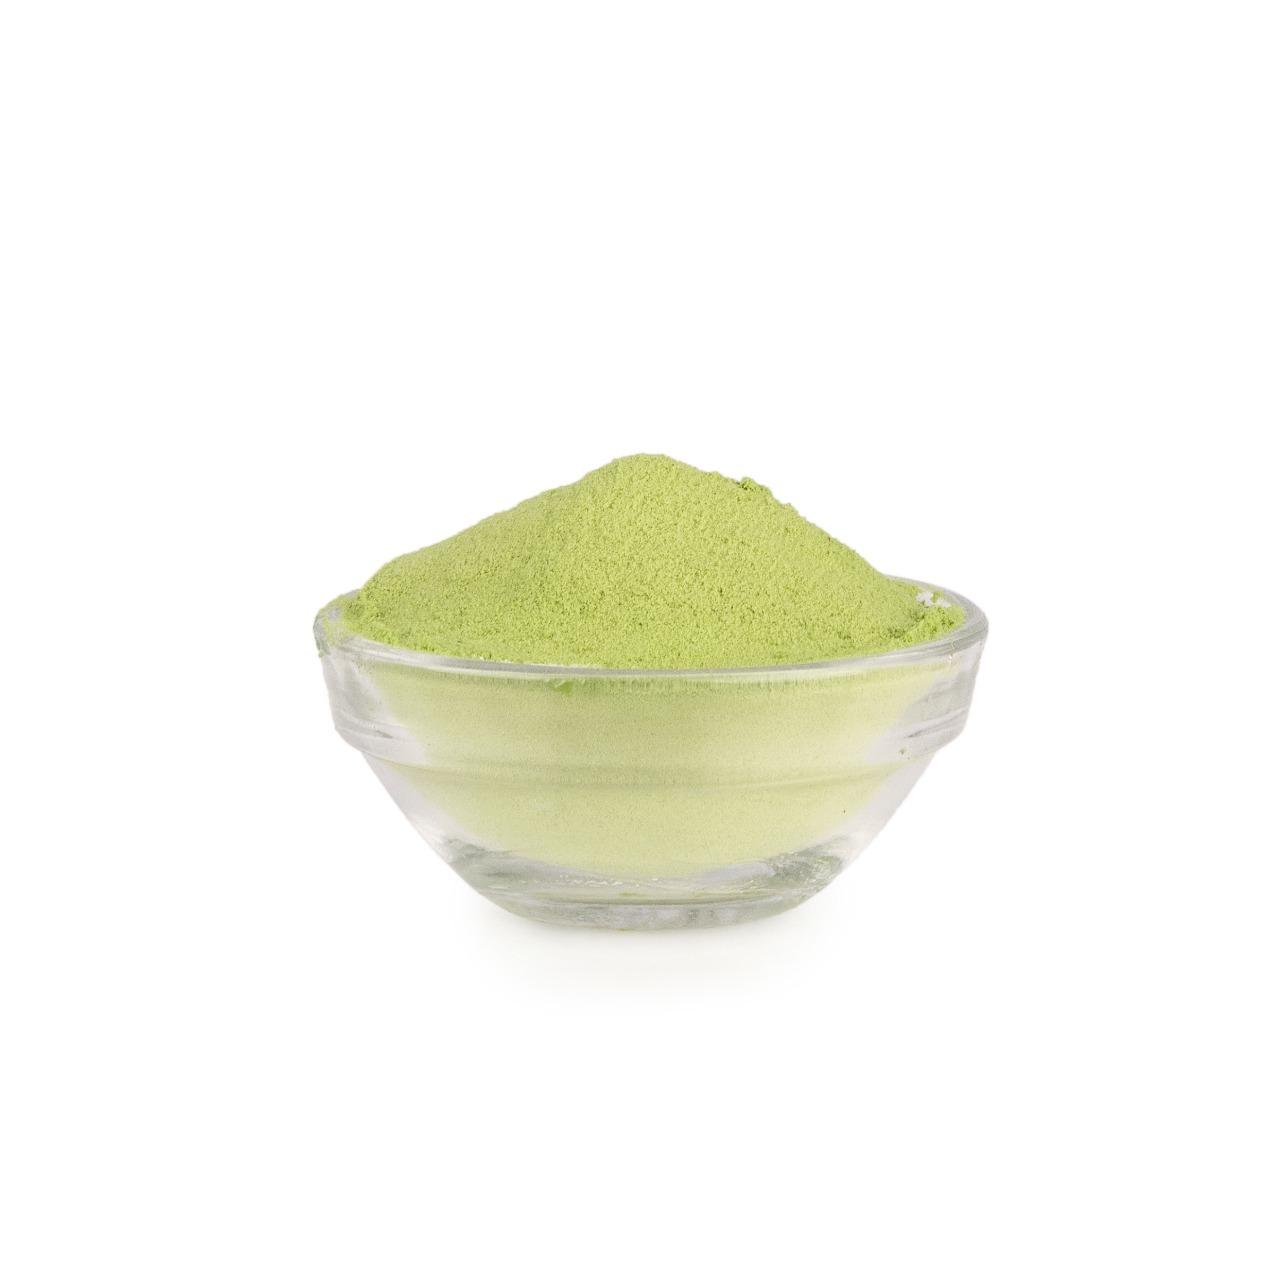 EDTA Chelated Mix MIcronutrient